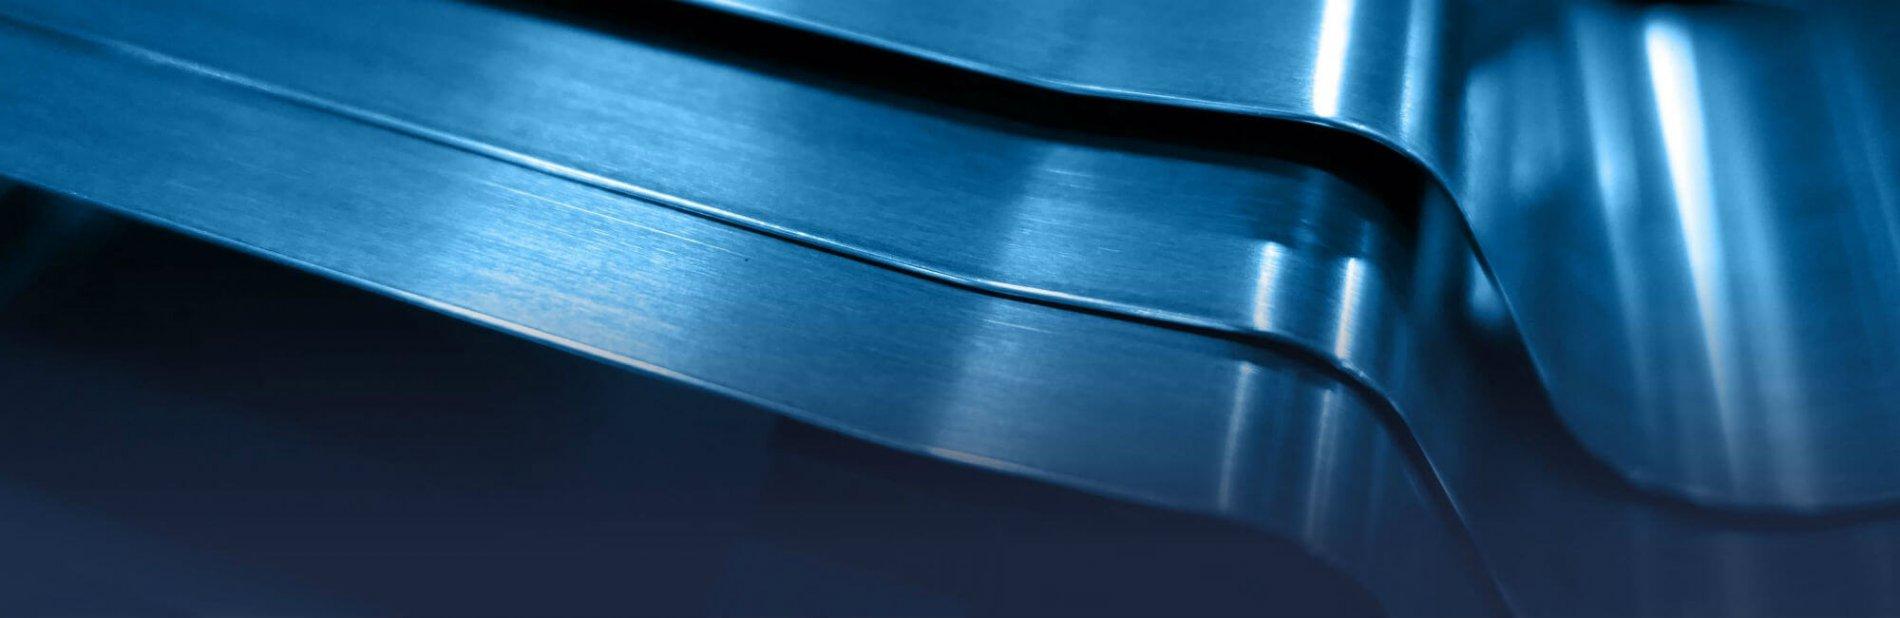 Flexsteel Blue Steel Spring Close-up